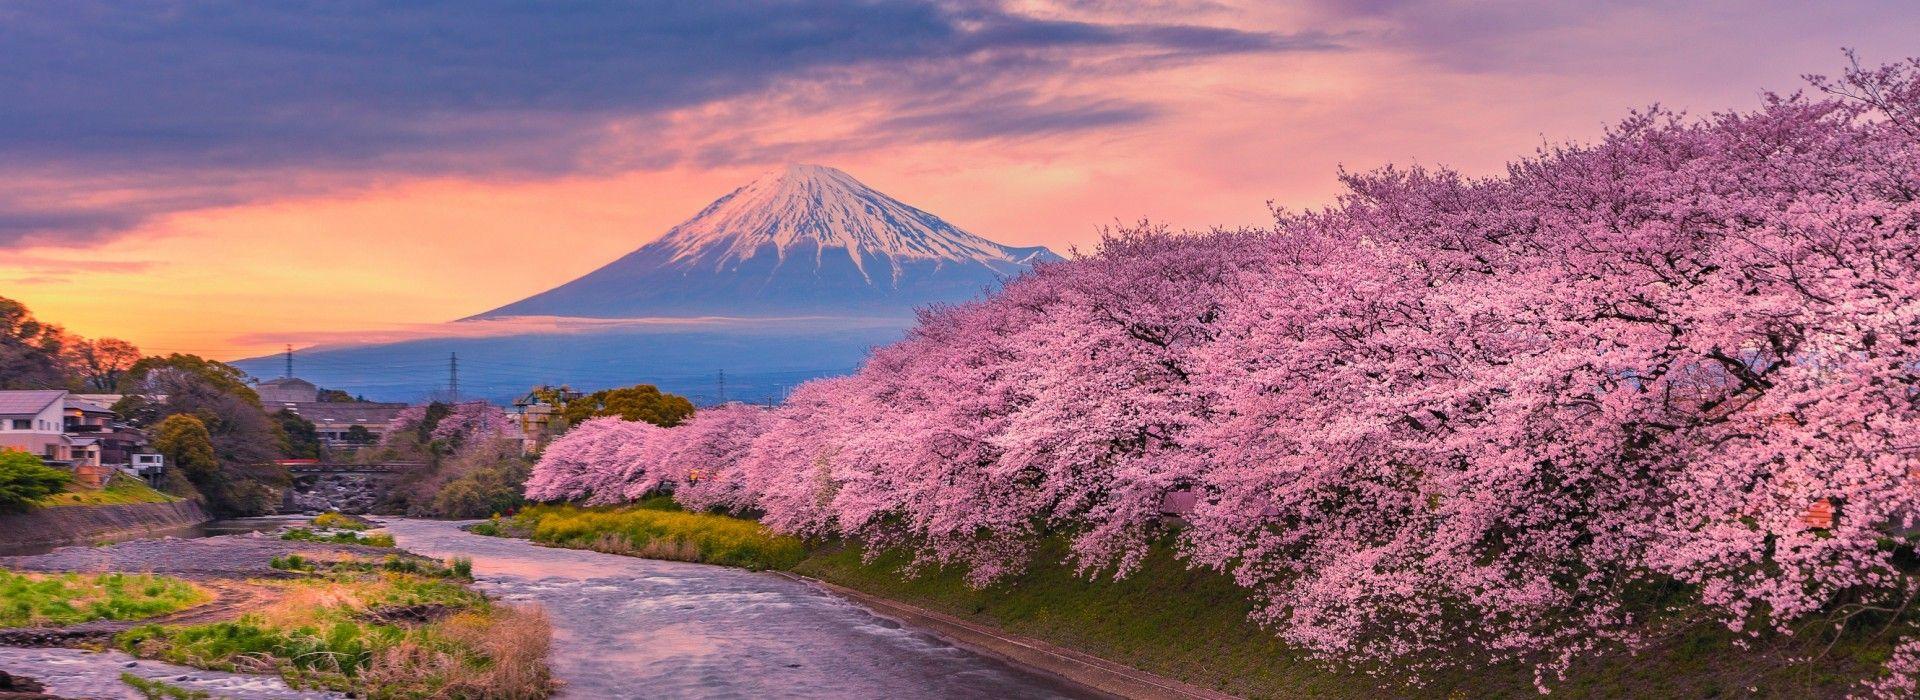 Wildlife Tours in Japan